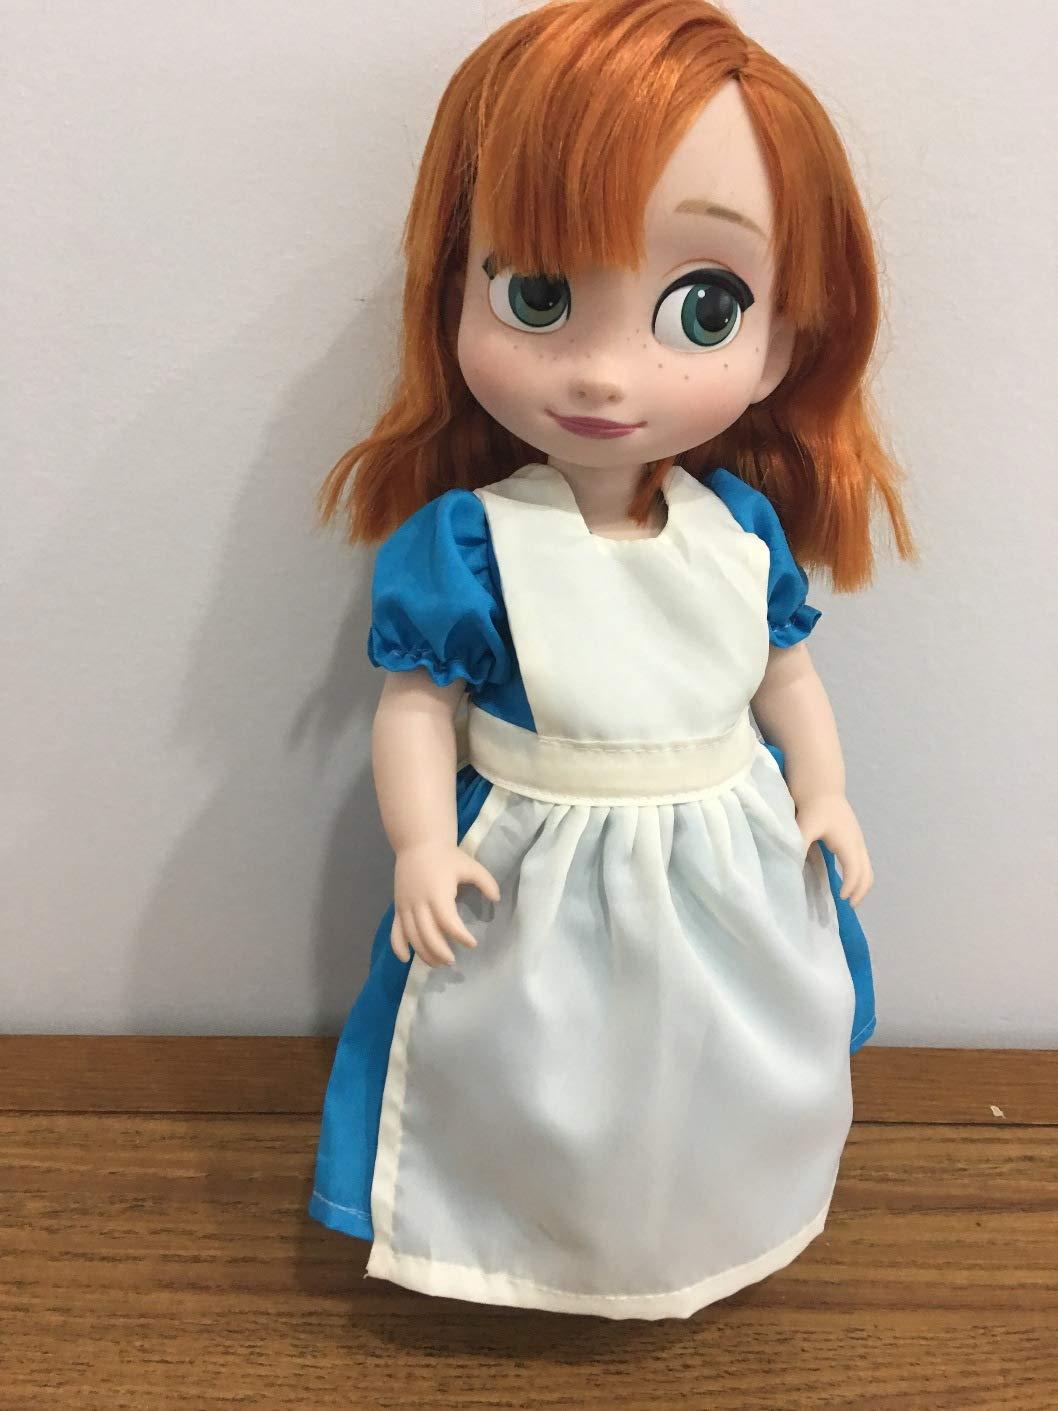 Fits 16' Disney Animators Doll Clothes Alice in Wonderland Replica Dress Blue White Costume NO DOLL